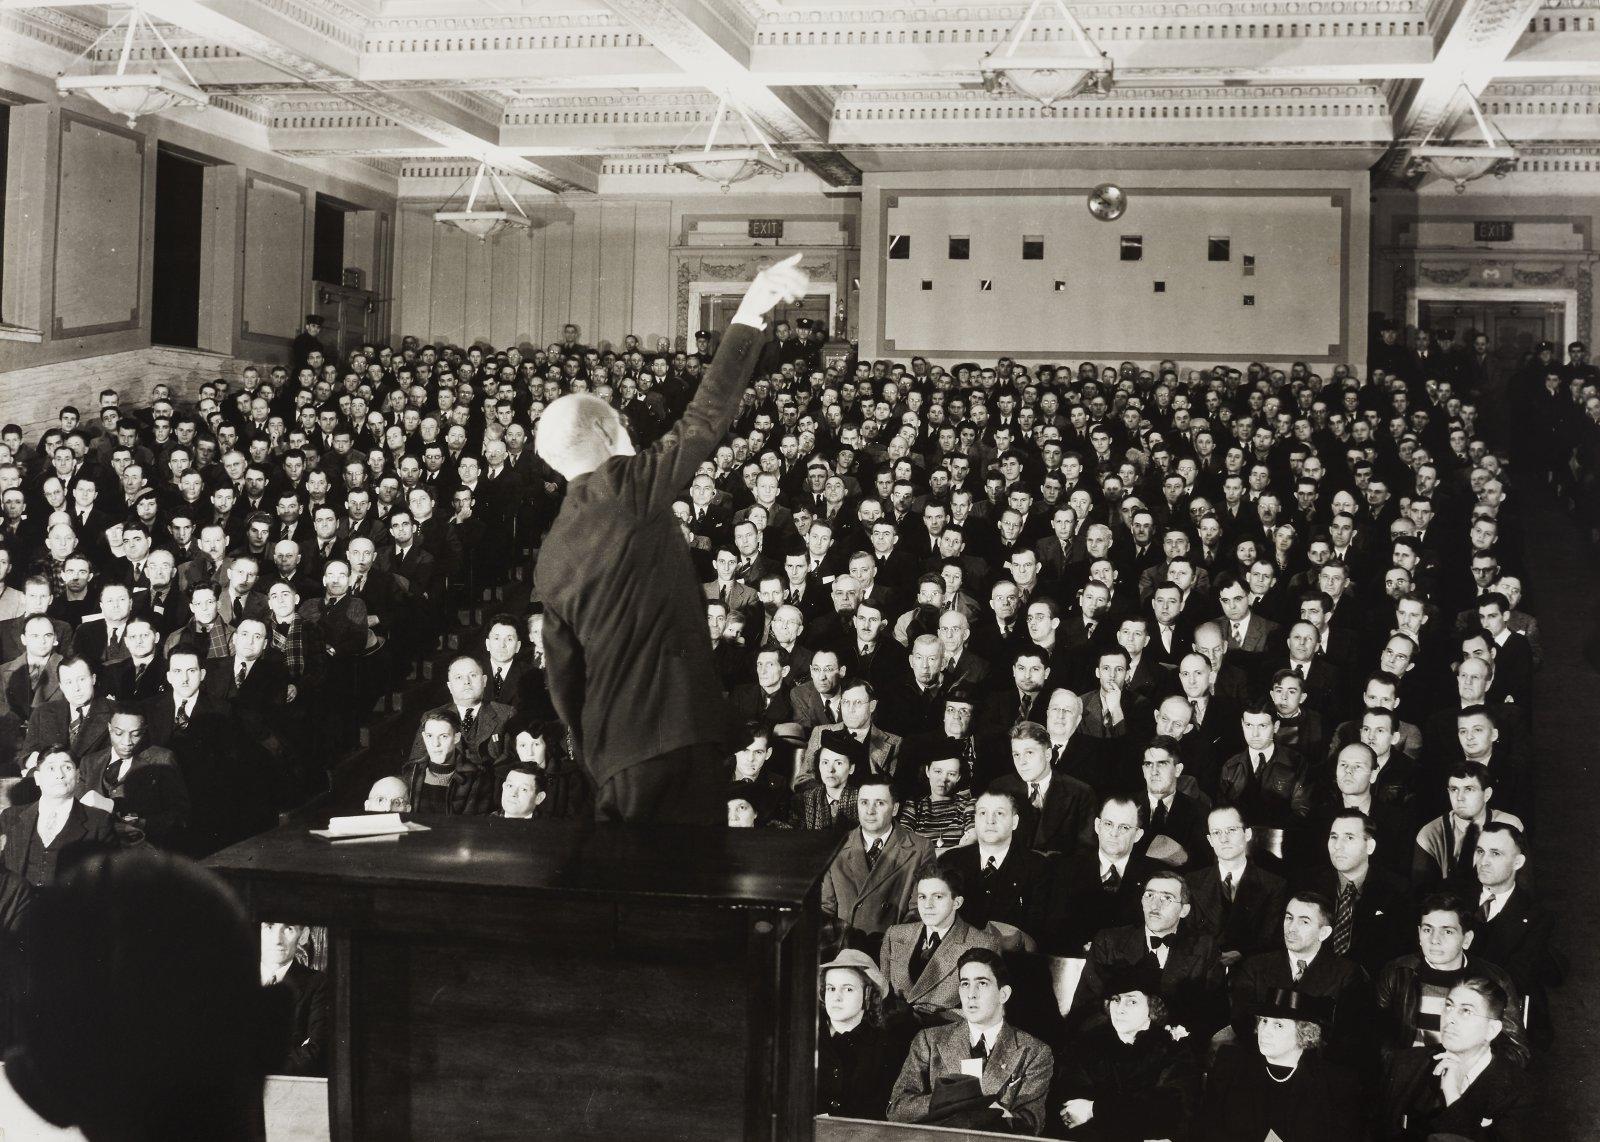 Edward Rohlke Farber, Foreman's Safety School - 9th Street Auditorium, Milwaukee Library, ca. 1940. Gelatin silver print